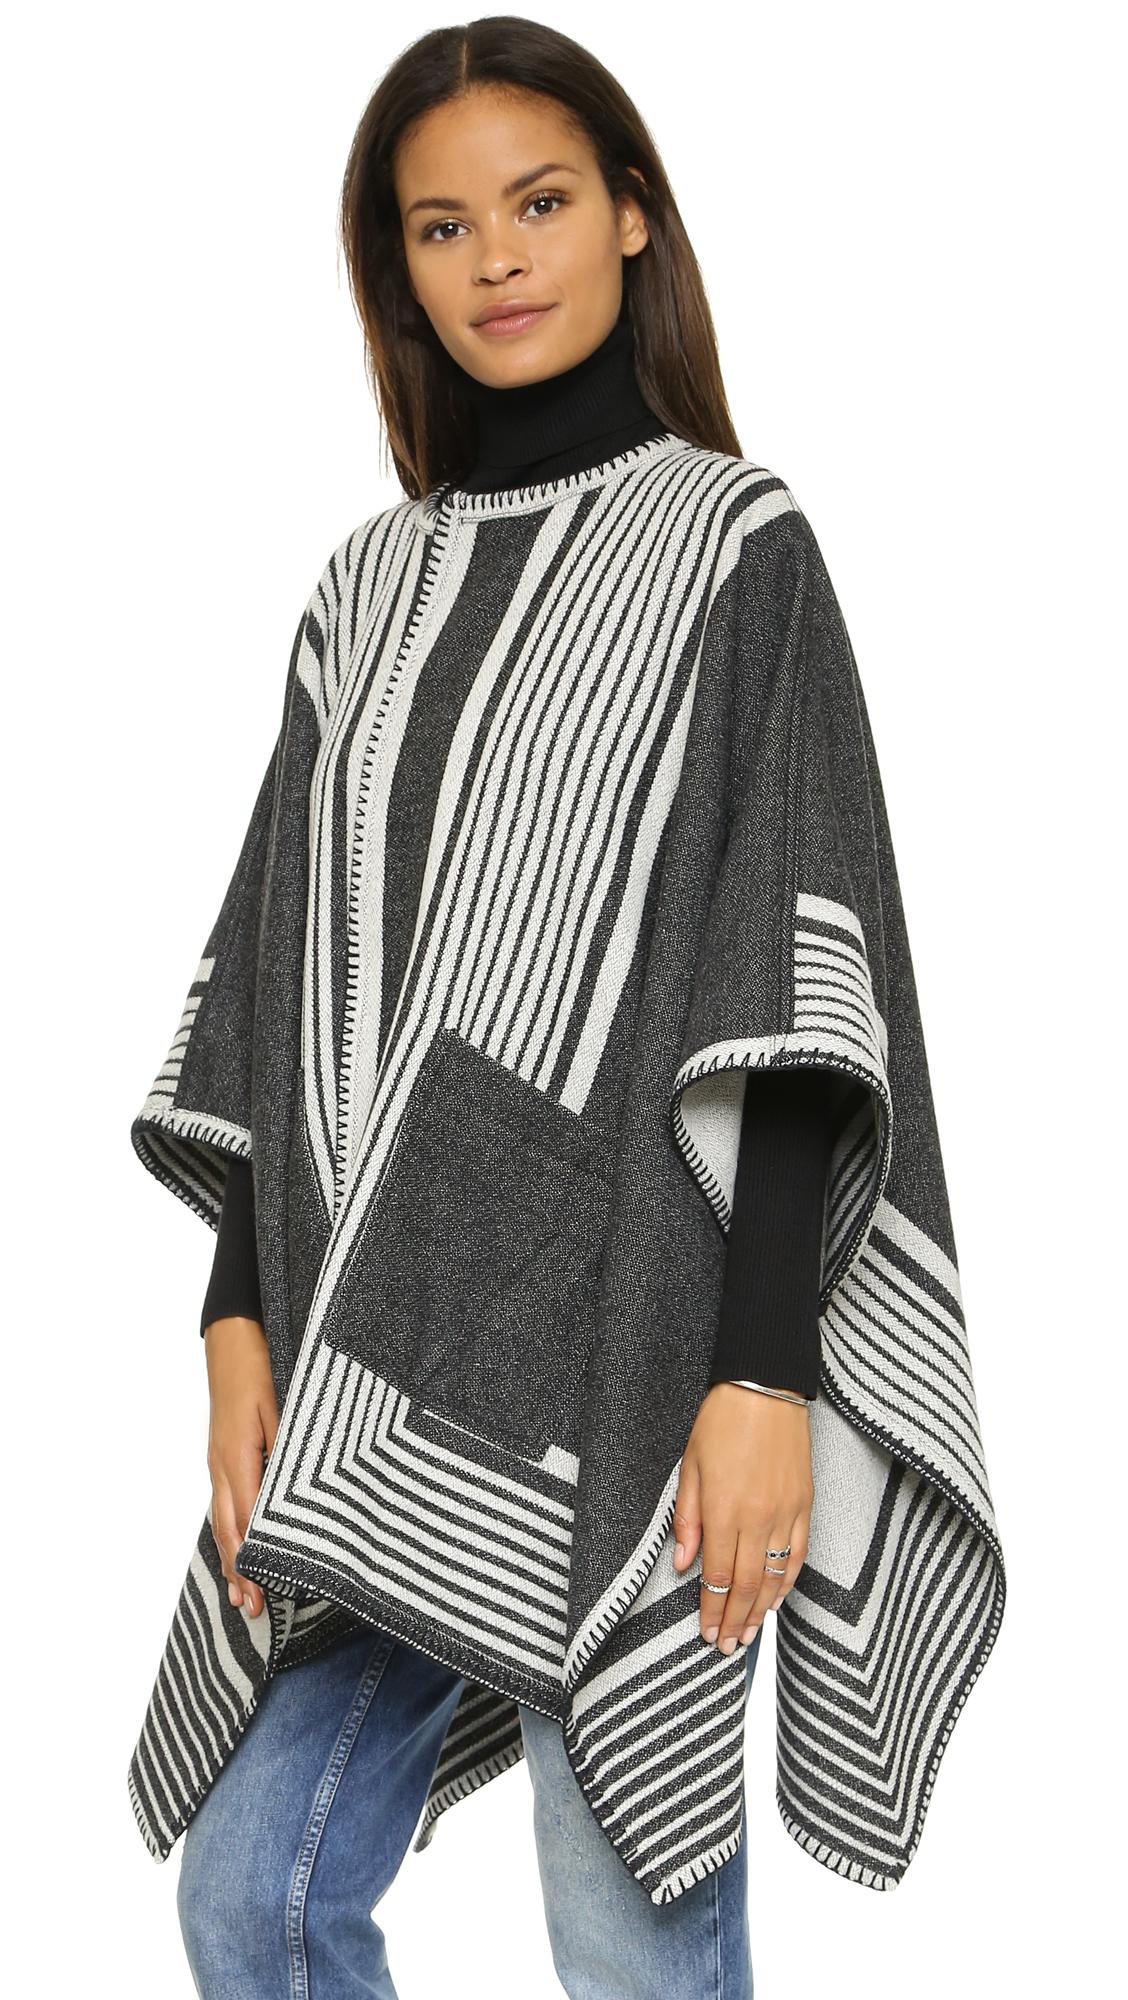 blanket wrap gallery YTTSZMY